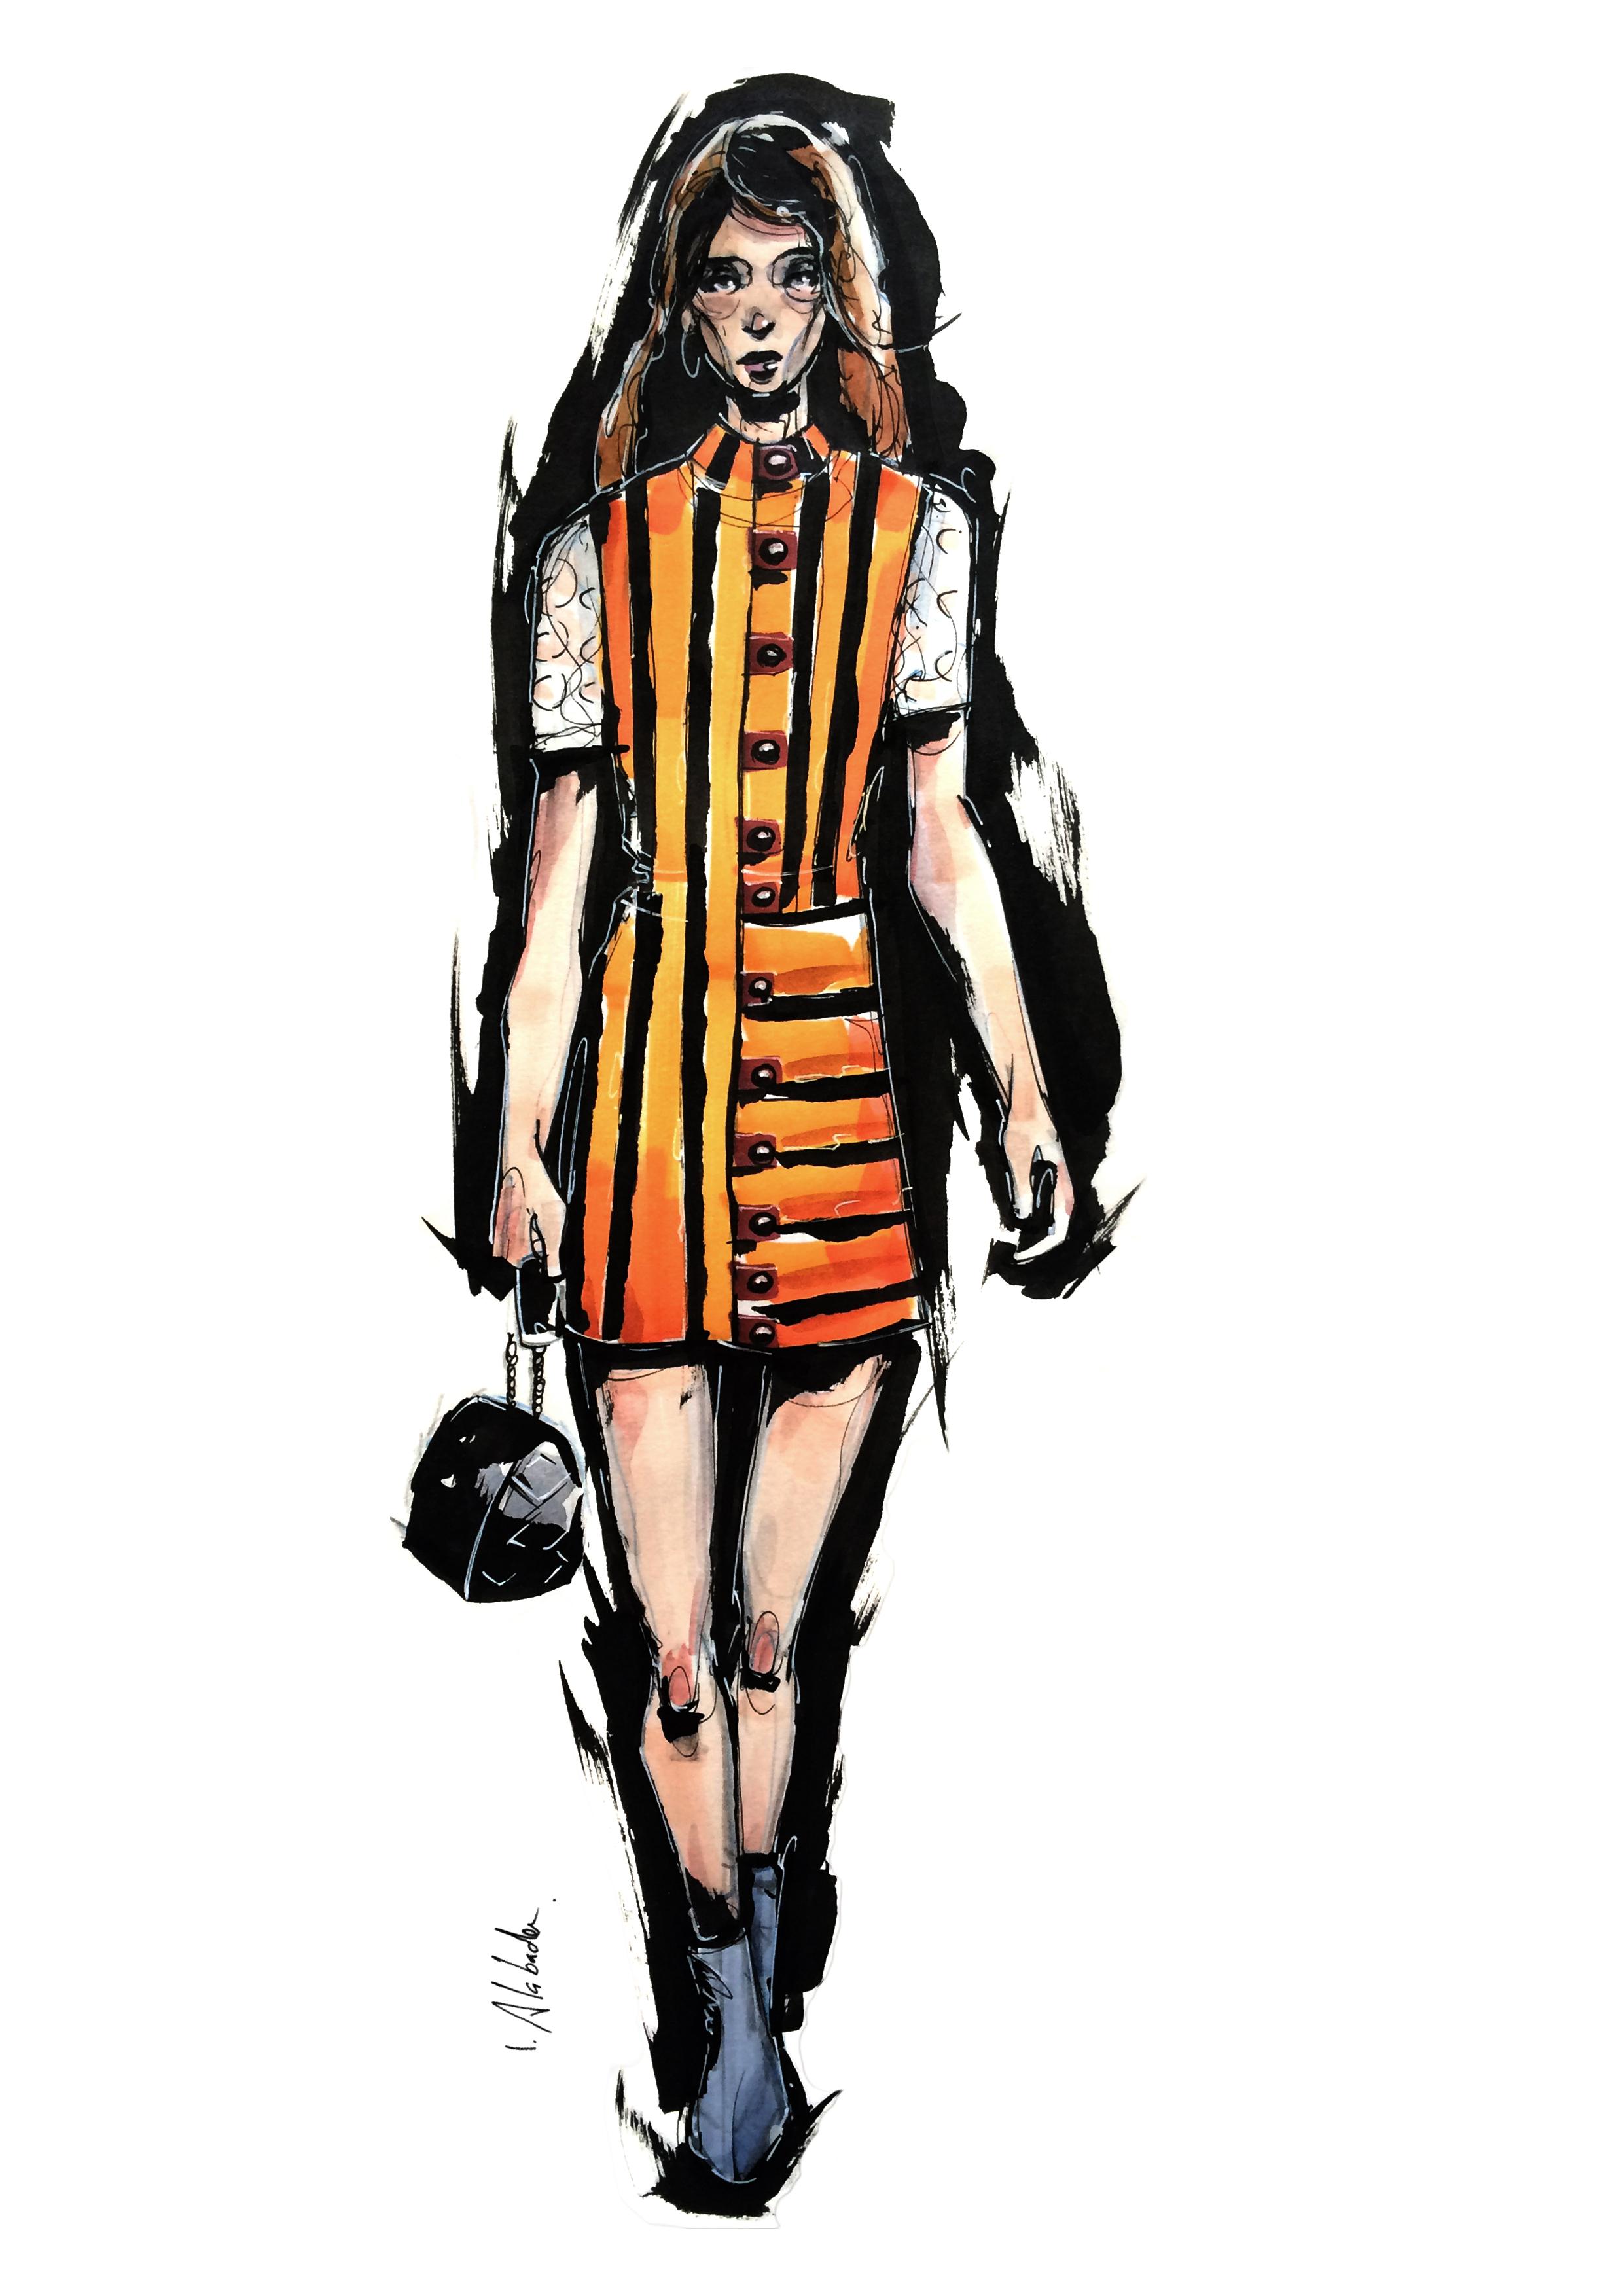 Louis Vuitton / fashion illustration